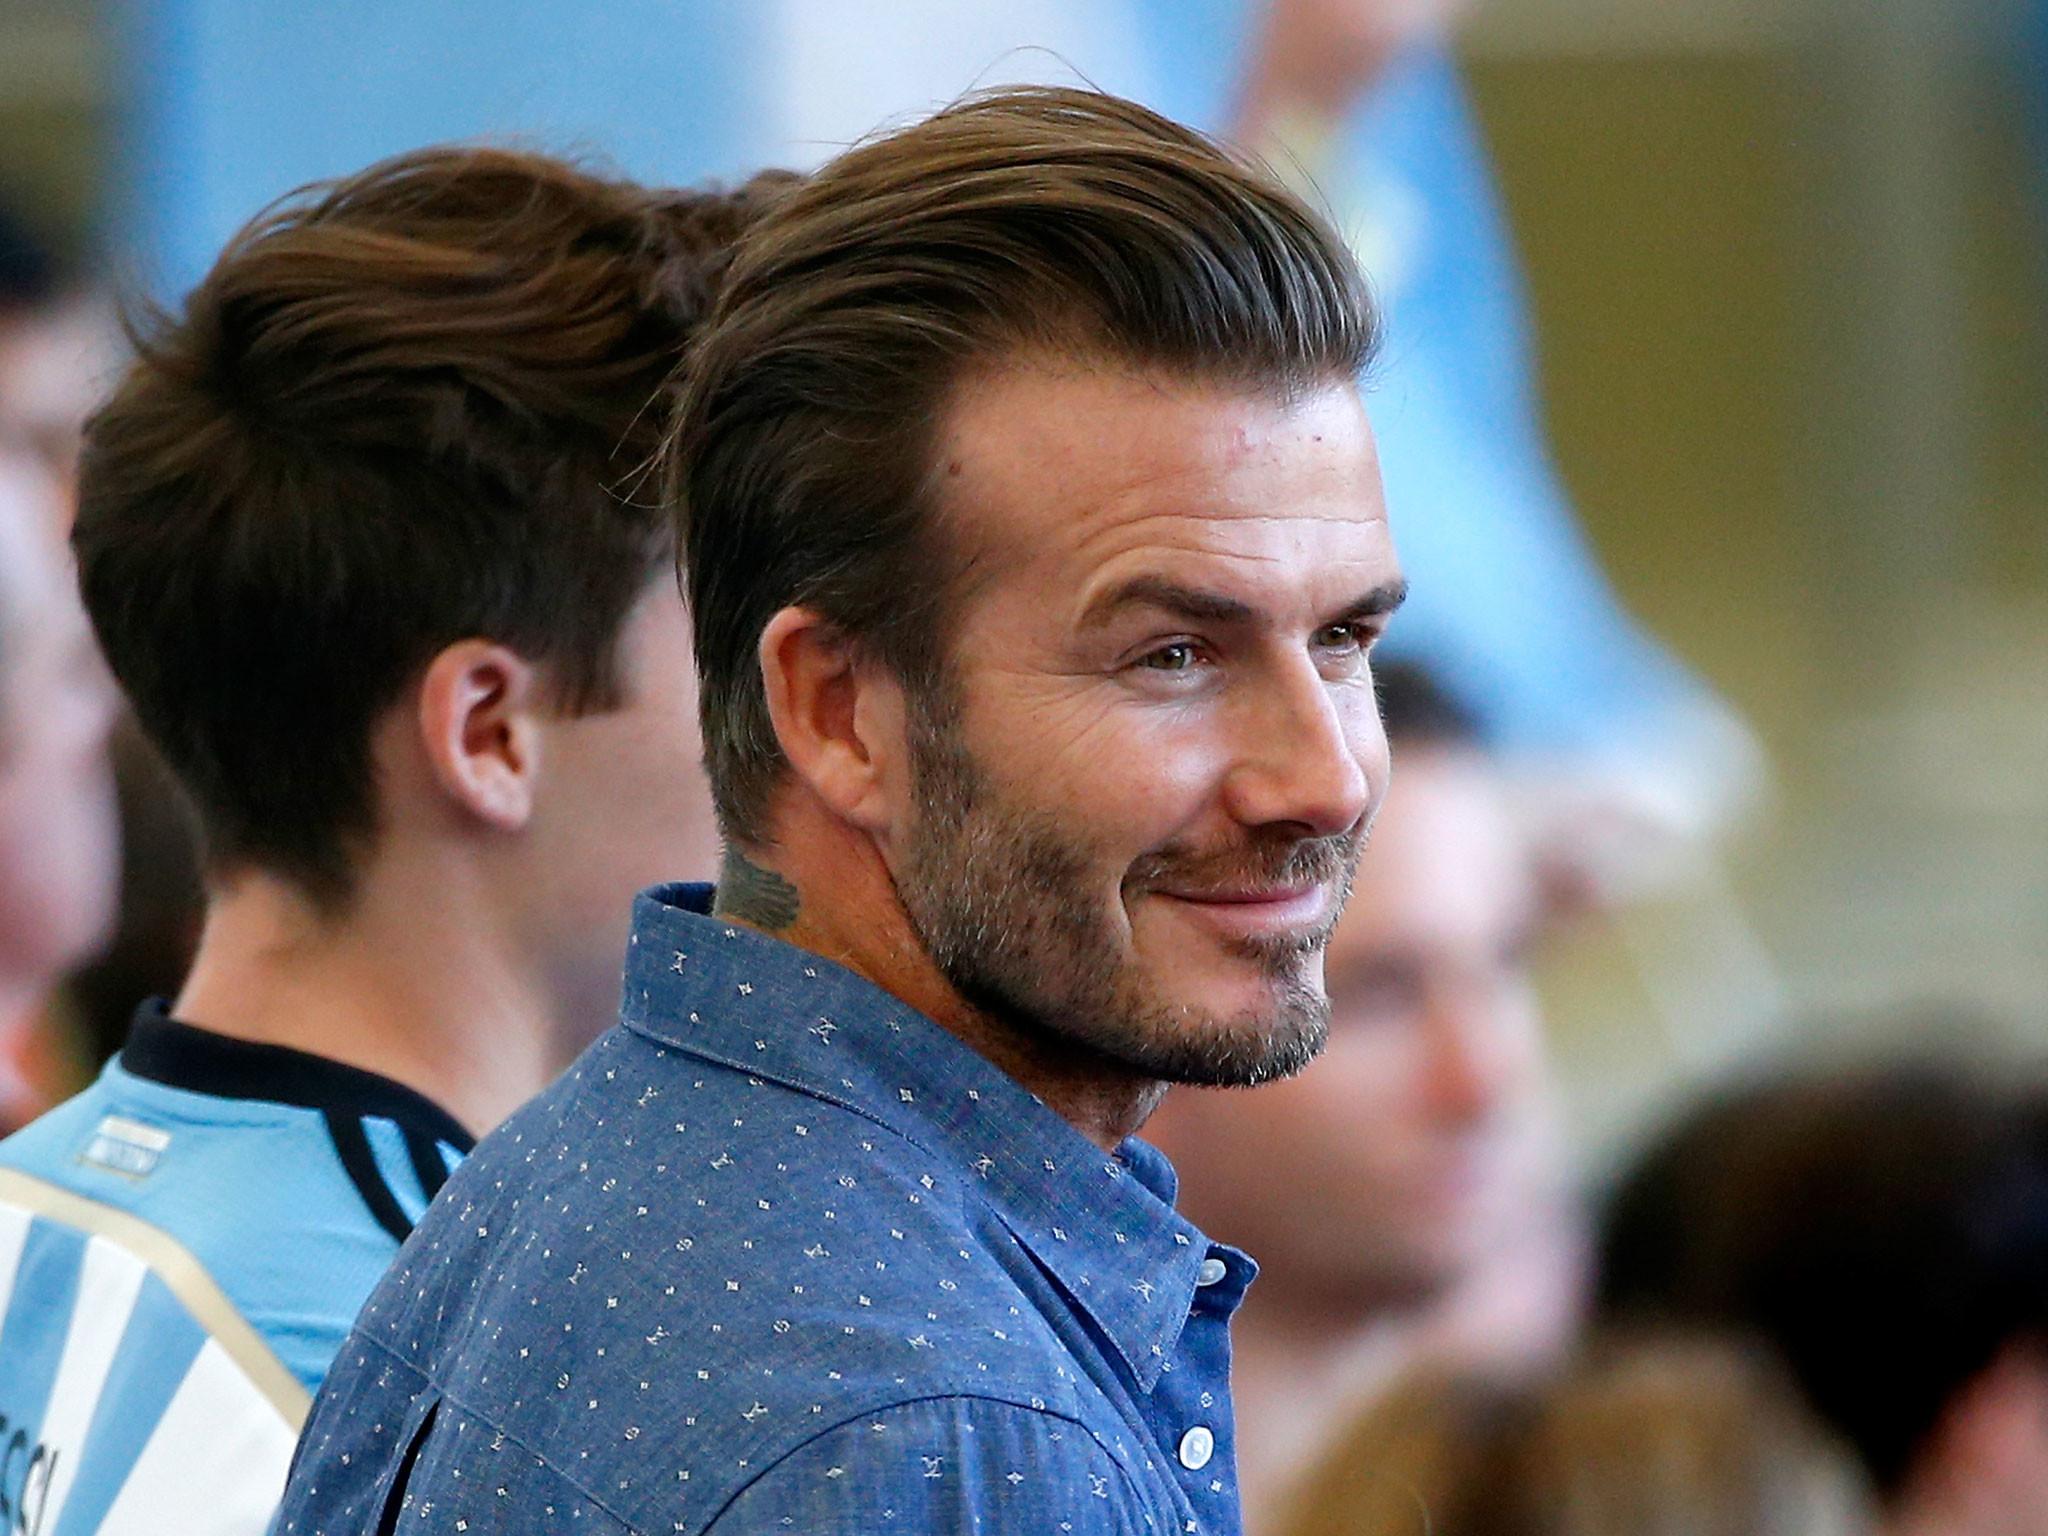 Res: 2048x1536, David Beckham